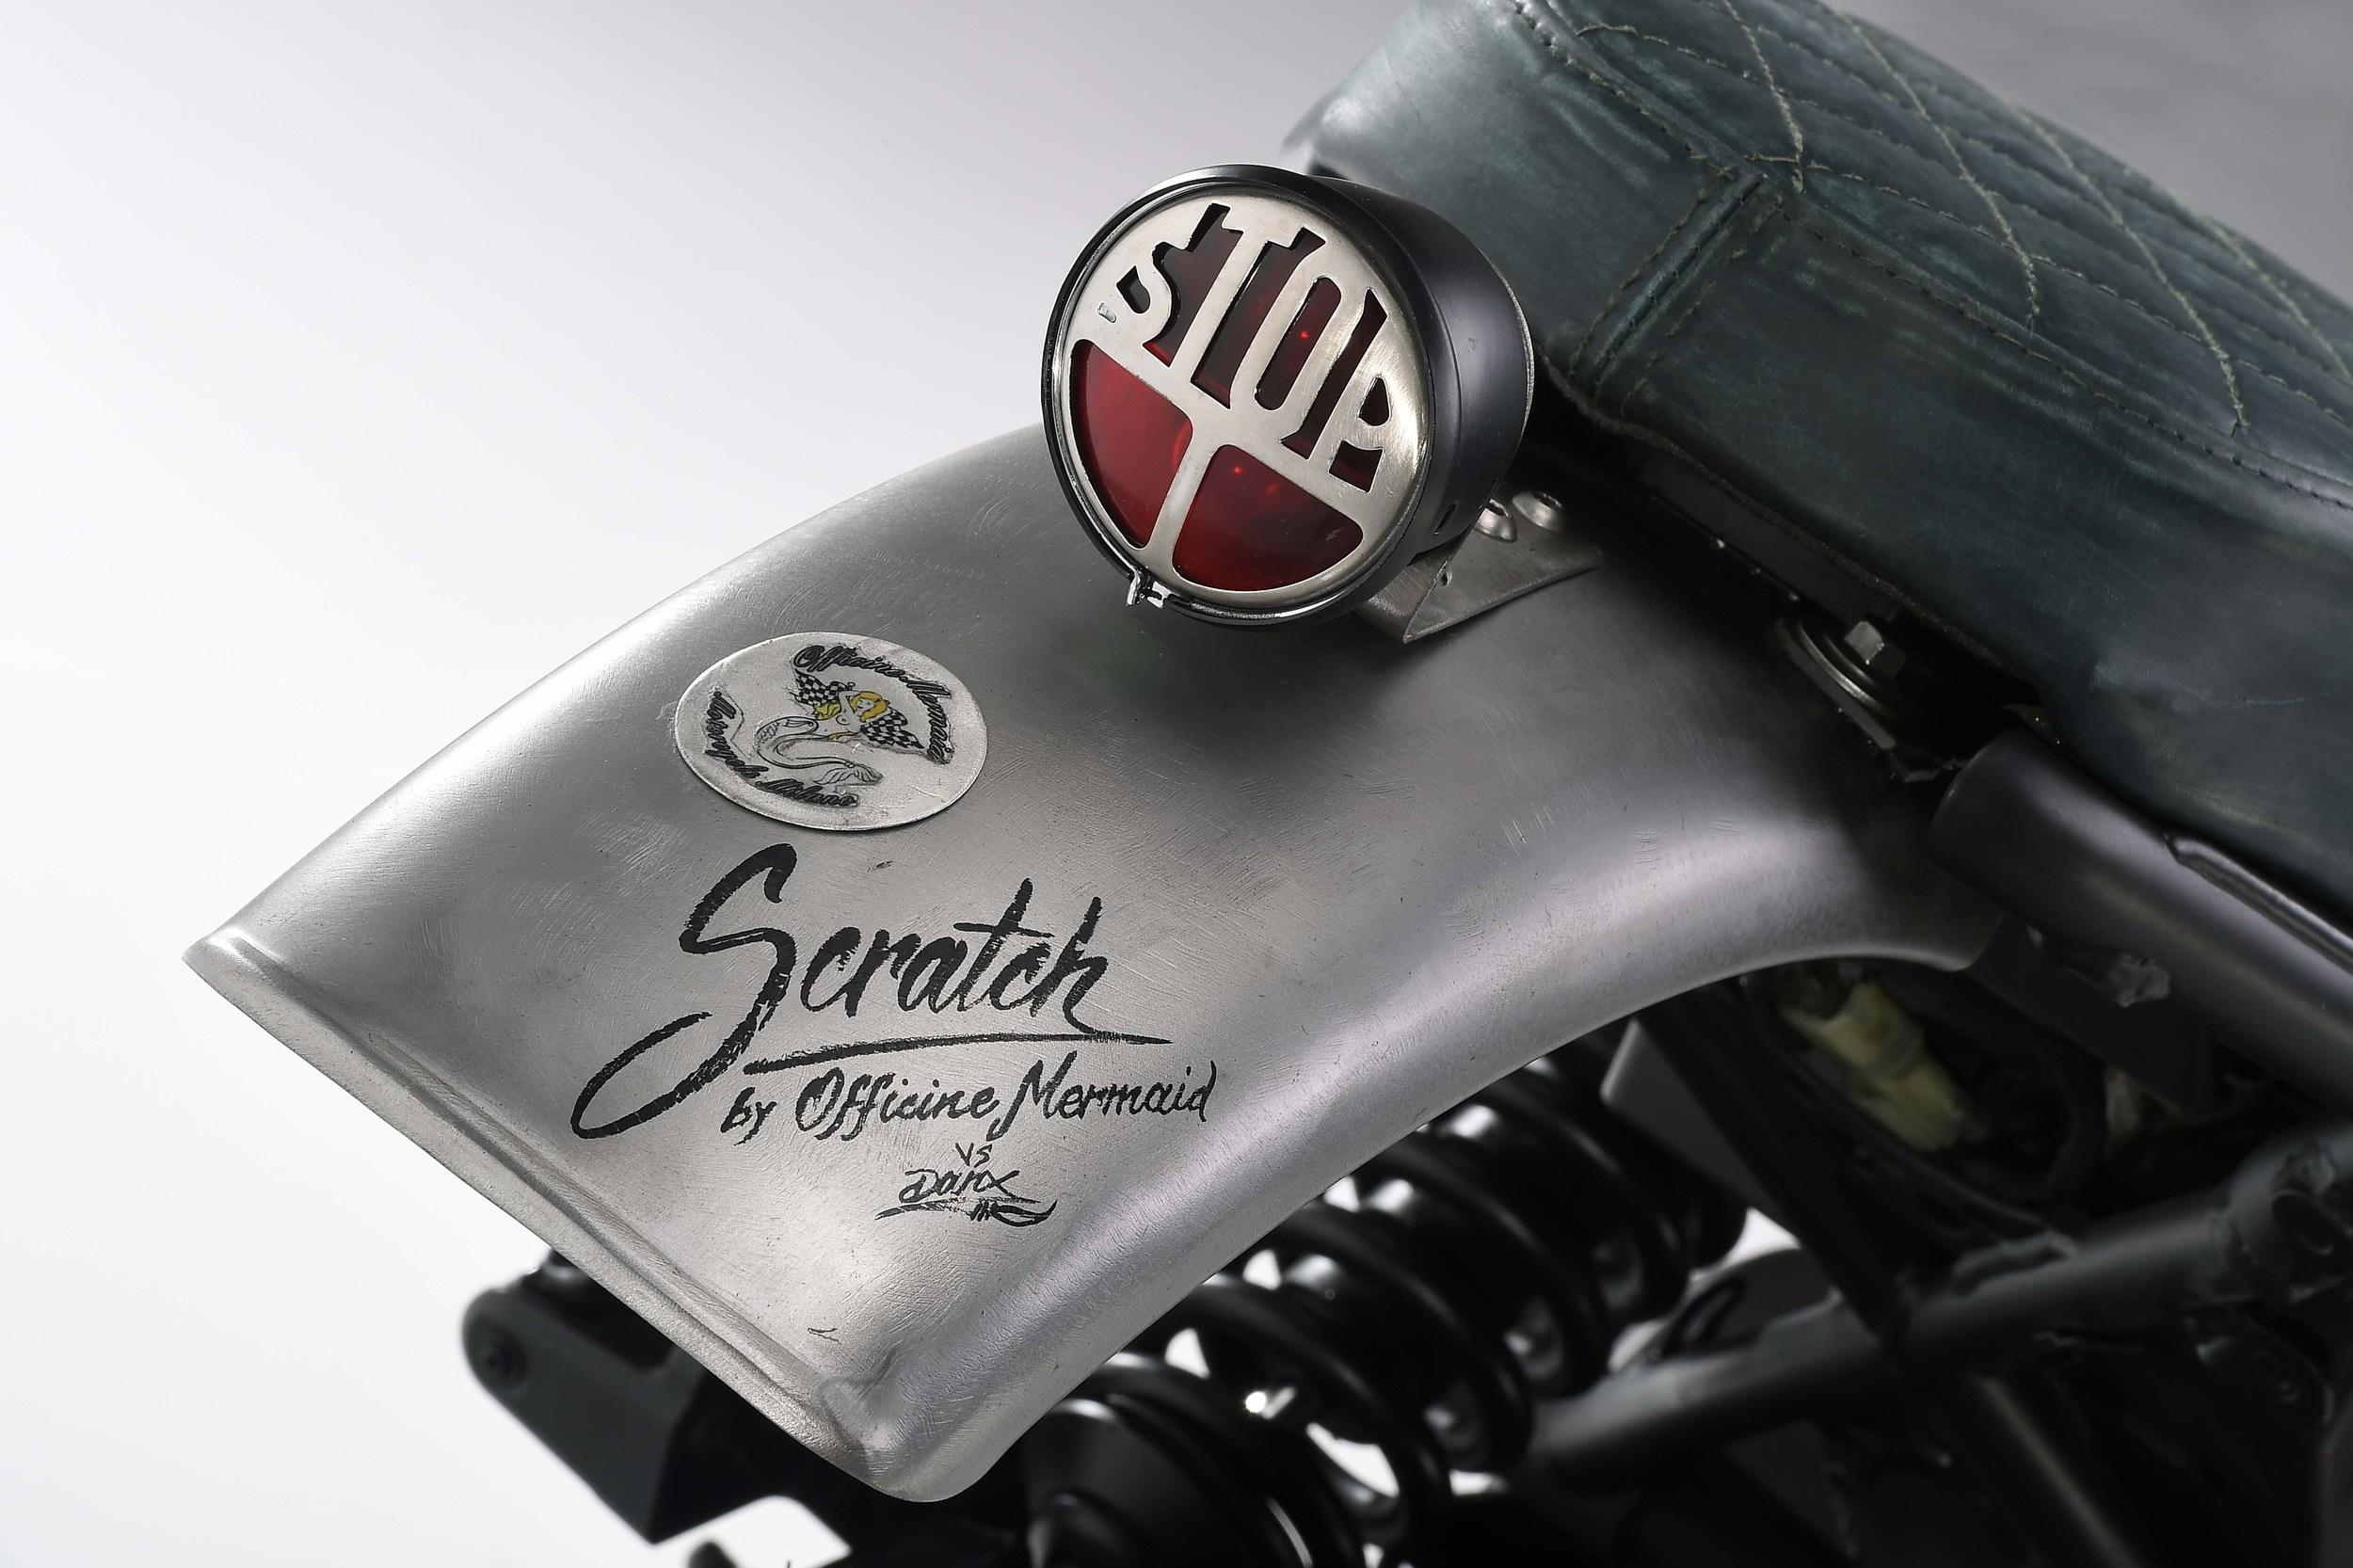 Ducati-Scrambler-Scratch-Concept-Officine-Mermaid-Dario-Mastroianni-04.jpg